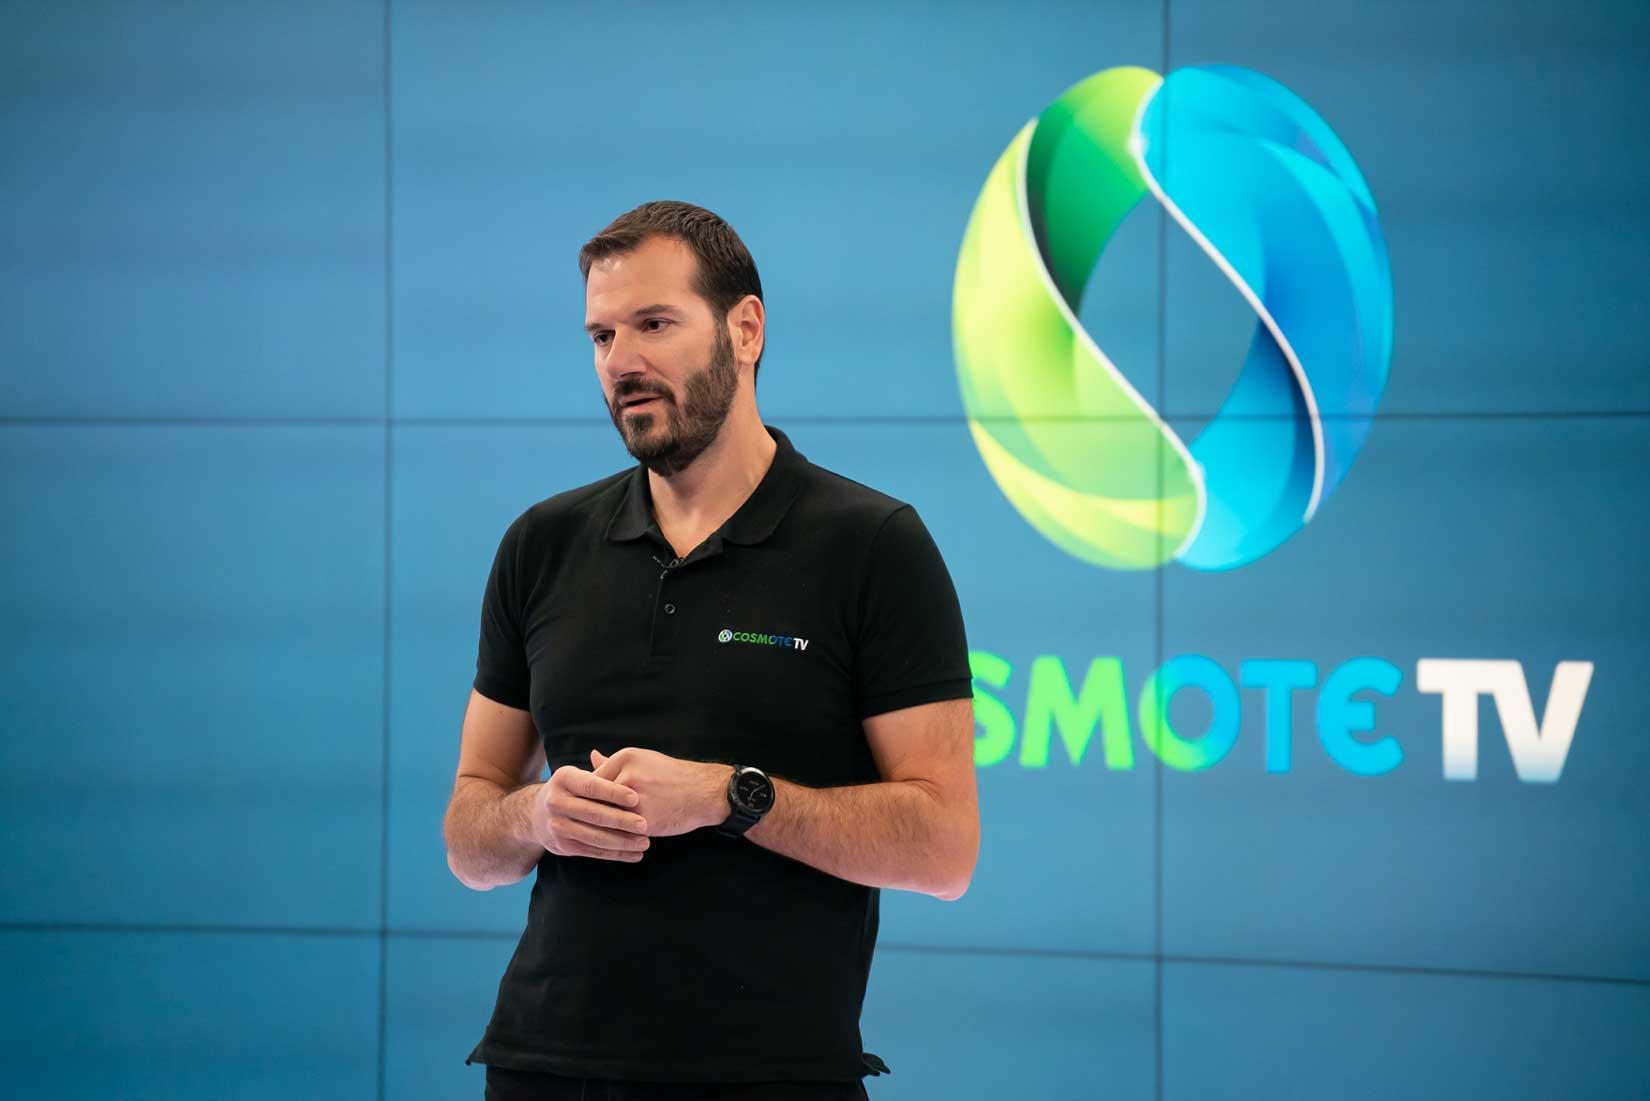 COSMOTE TV: Νέα εποχή με Android αποκωδικοποιητή και Over